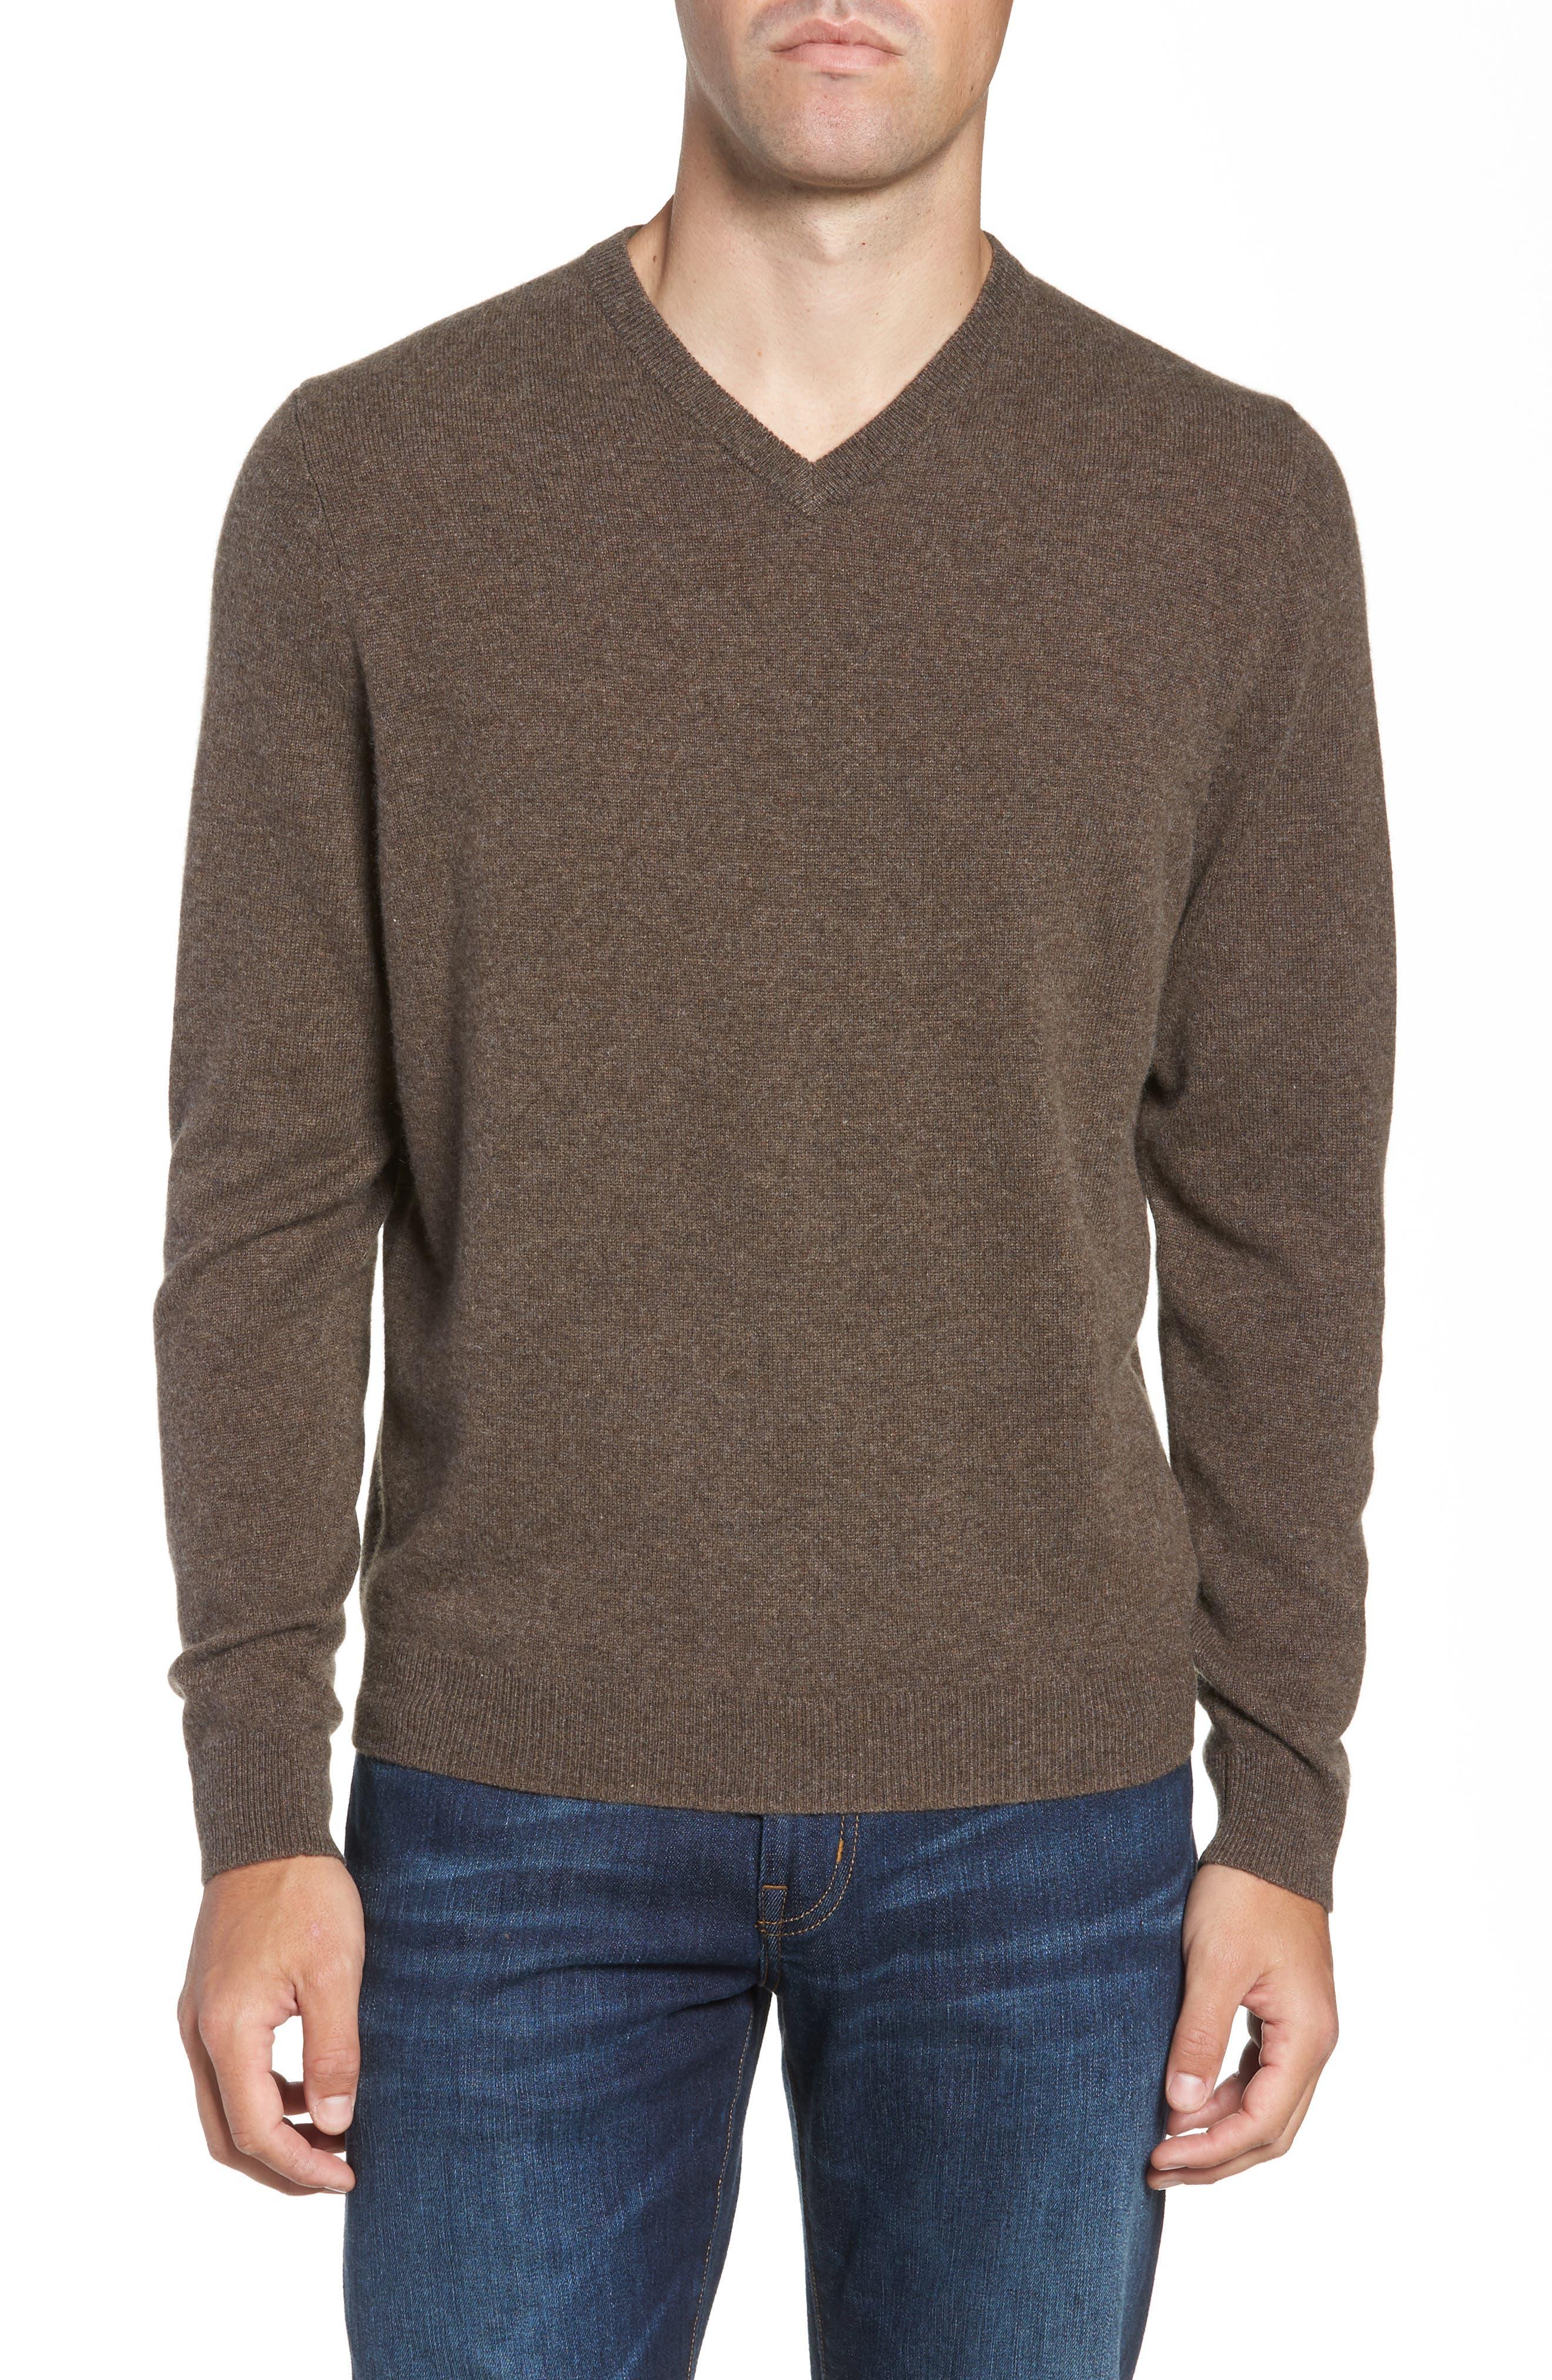 Cashmere V-Neck Sweater,                             Main thumbnail 1, color,                             210